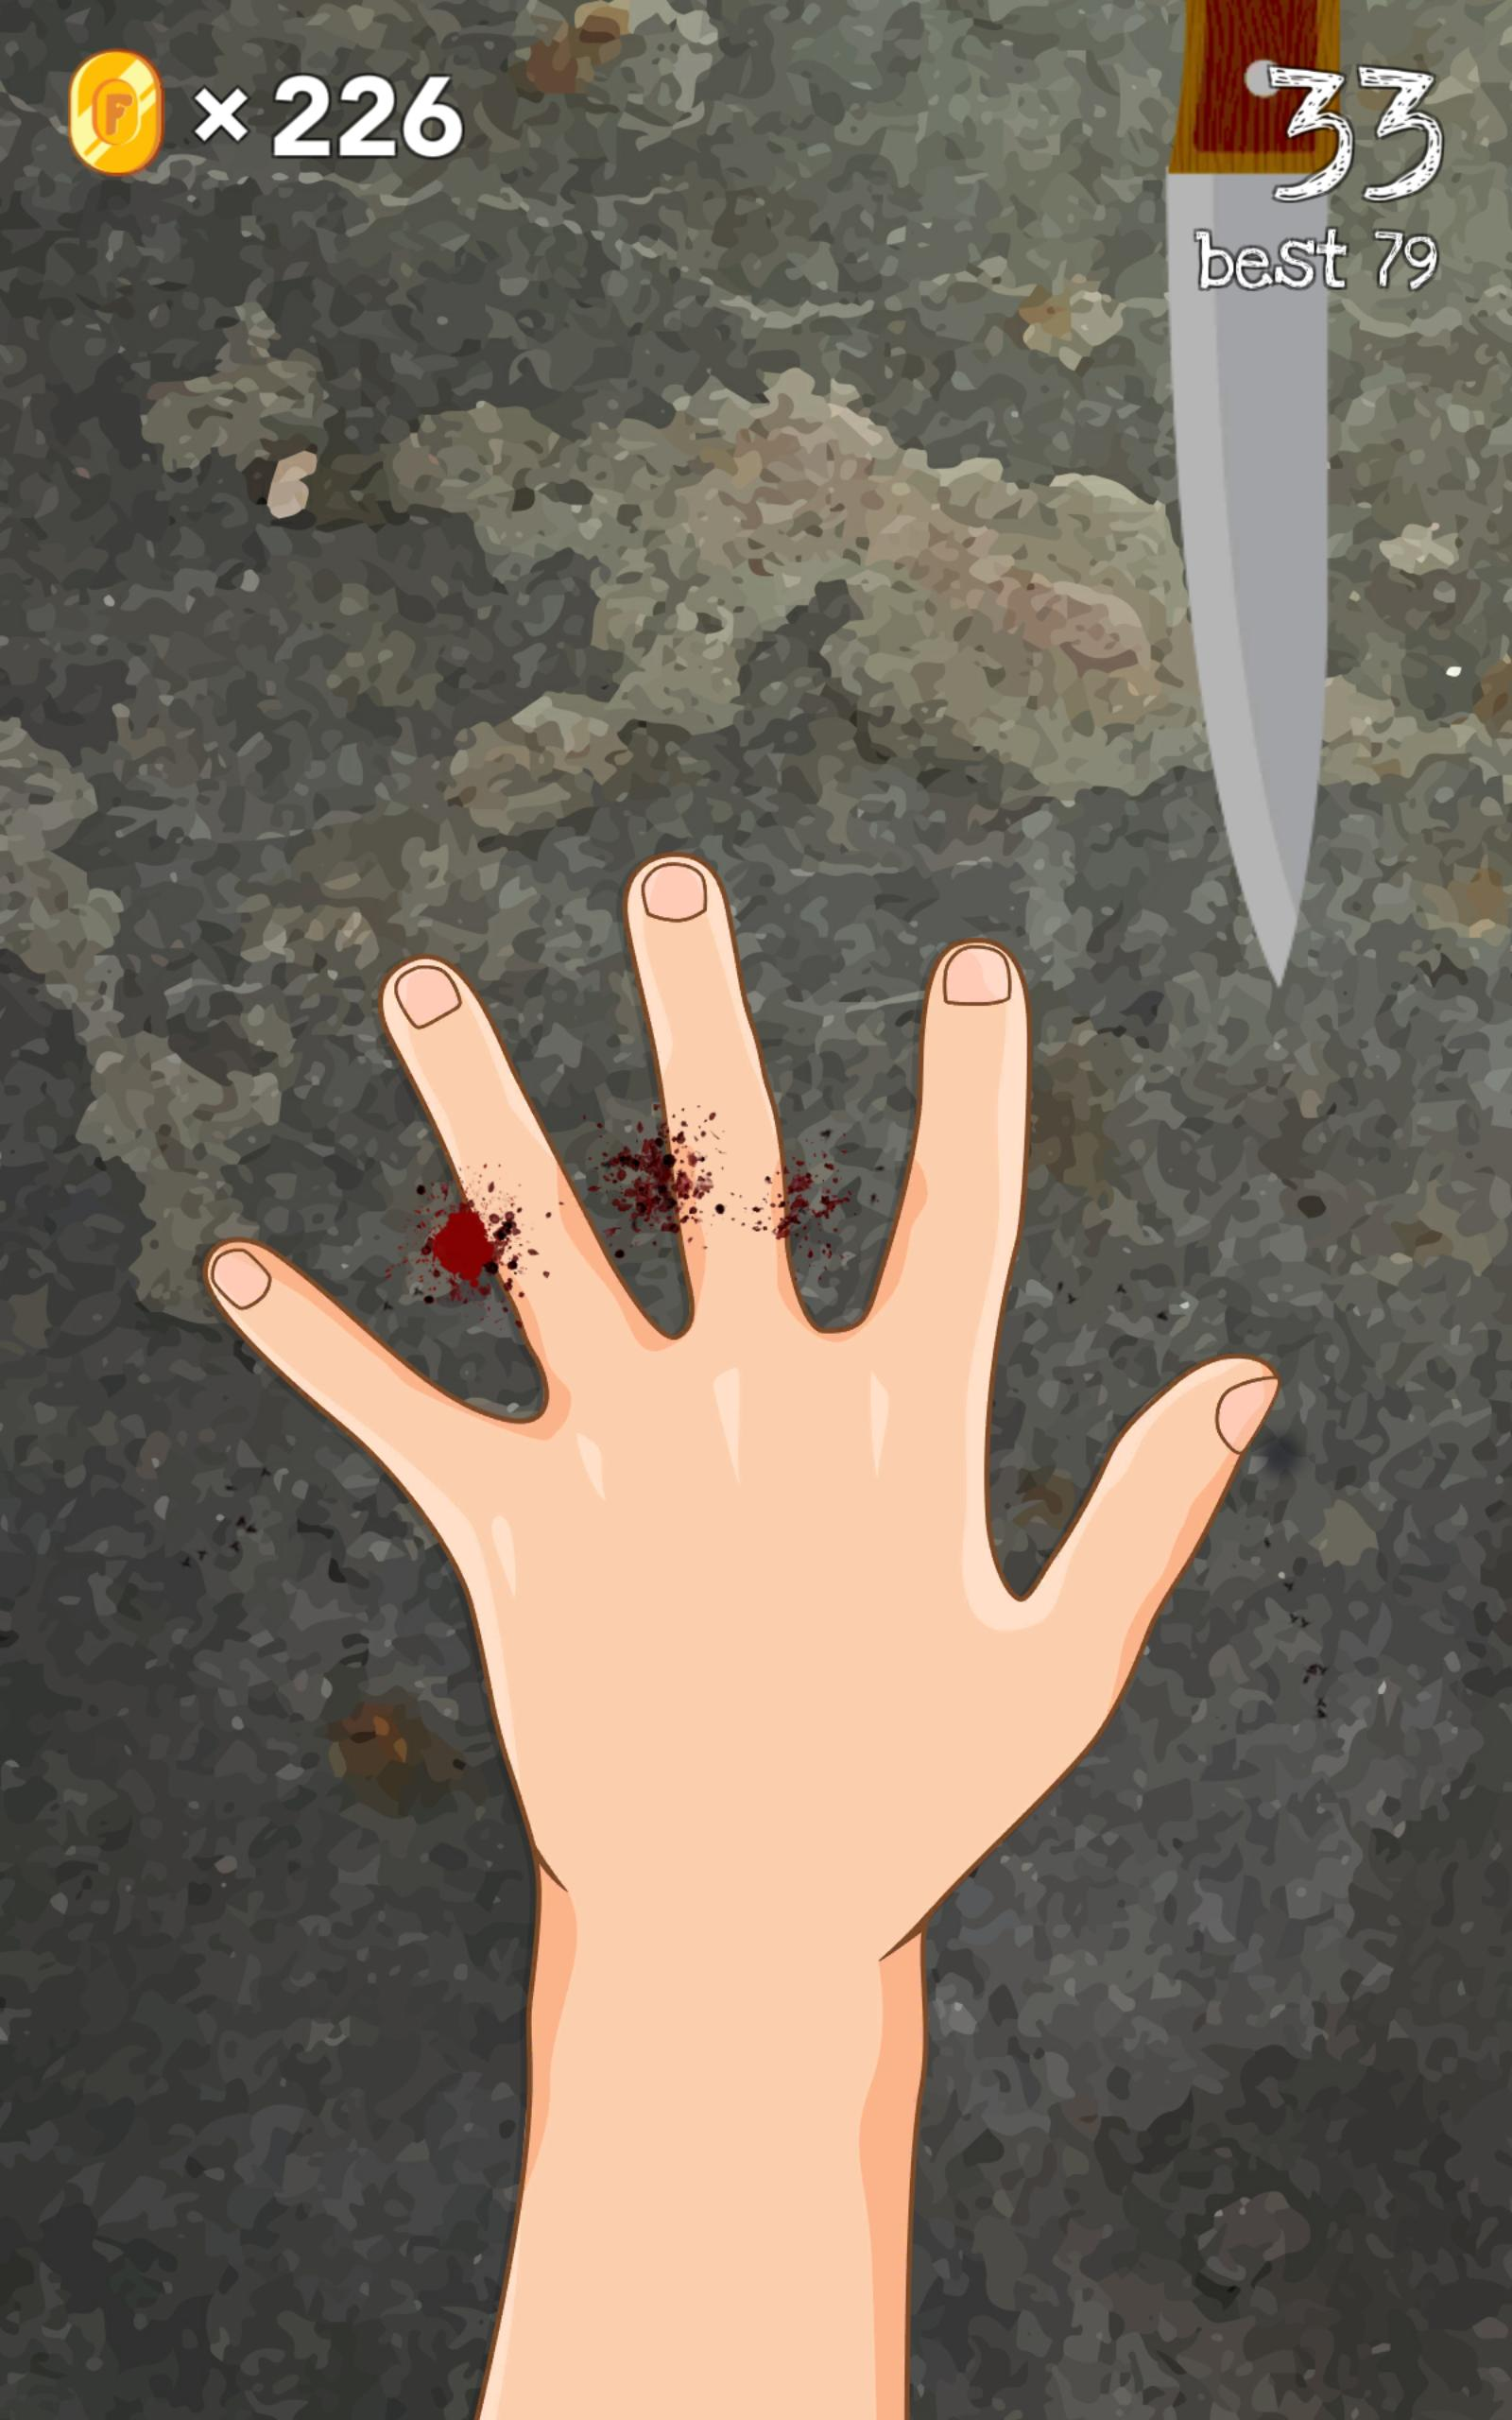 4 Fingers - free knife games 3.4 Screenshot 15